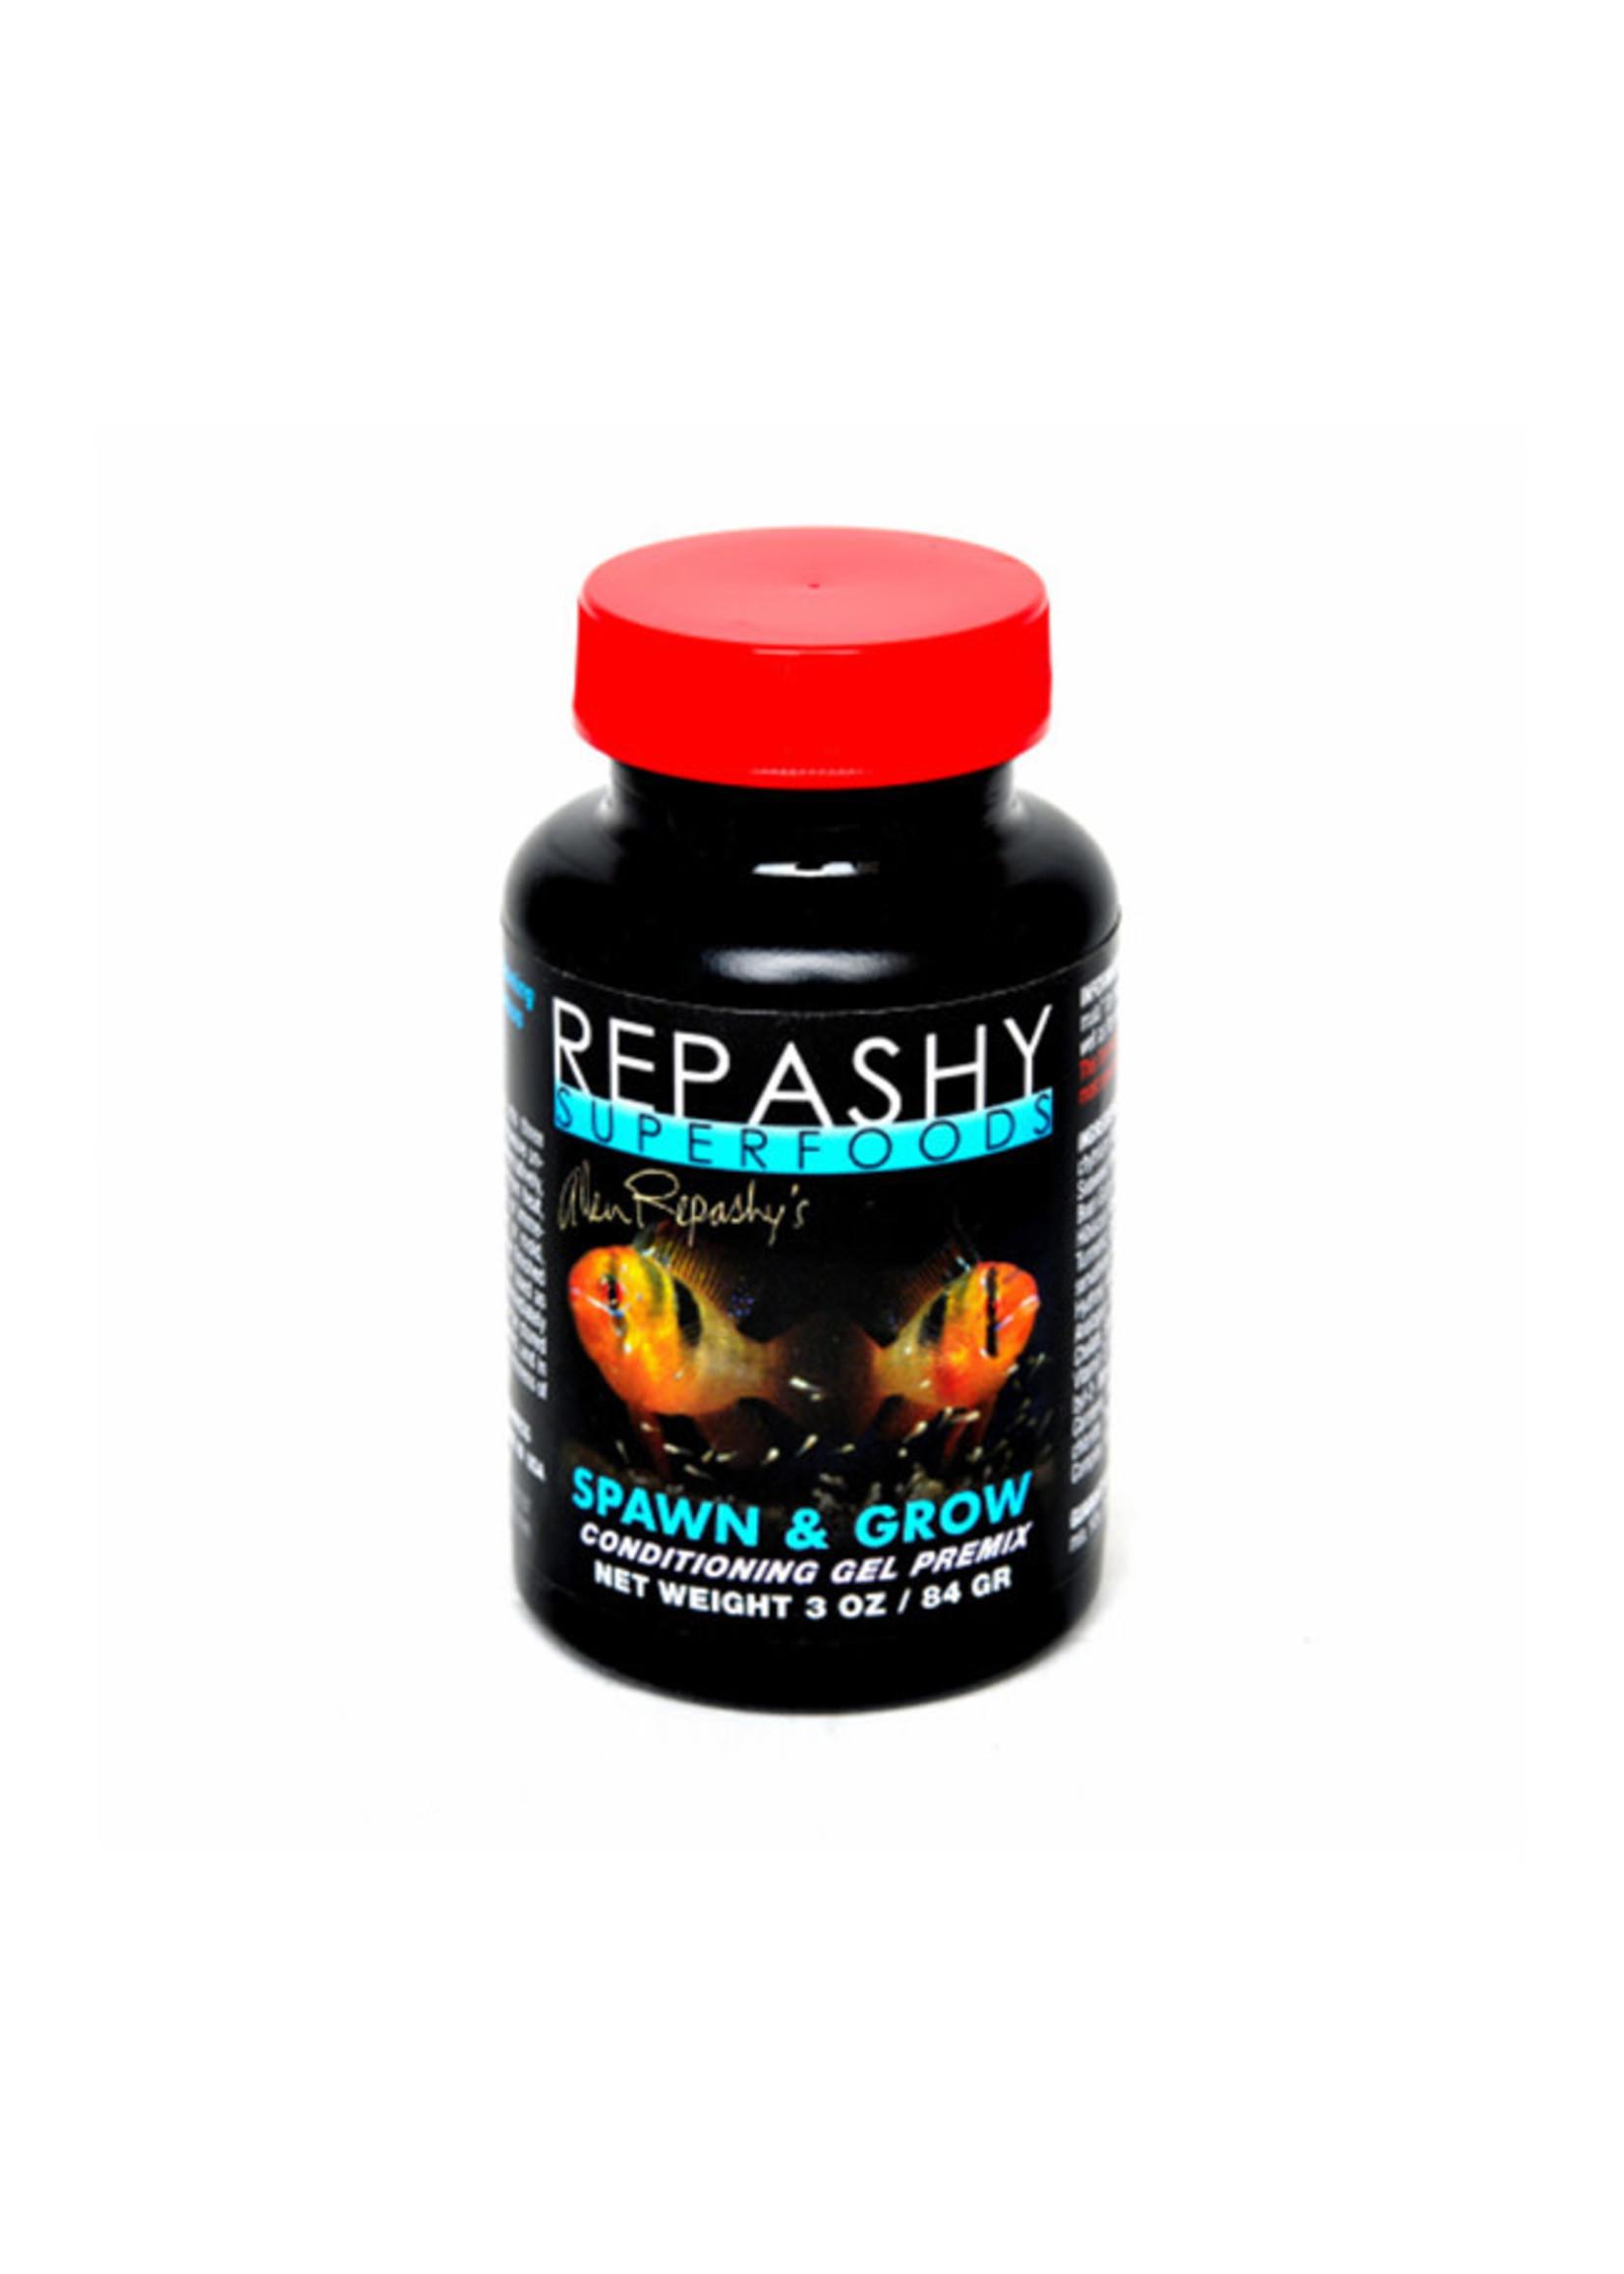 Repashy Superfoods Repashy Spawn & Grow Conditioning Gel Premix 85g / 3oz